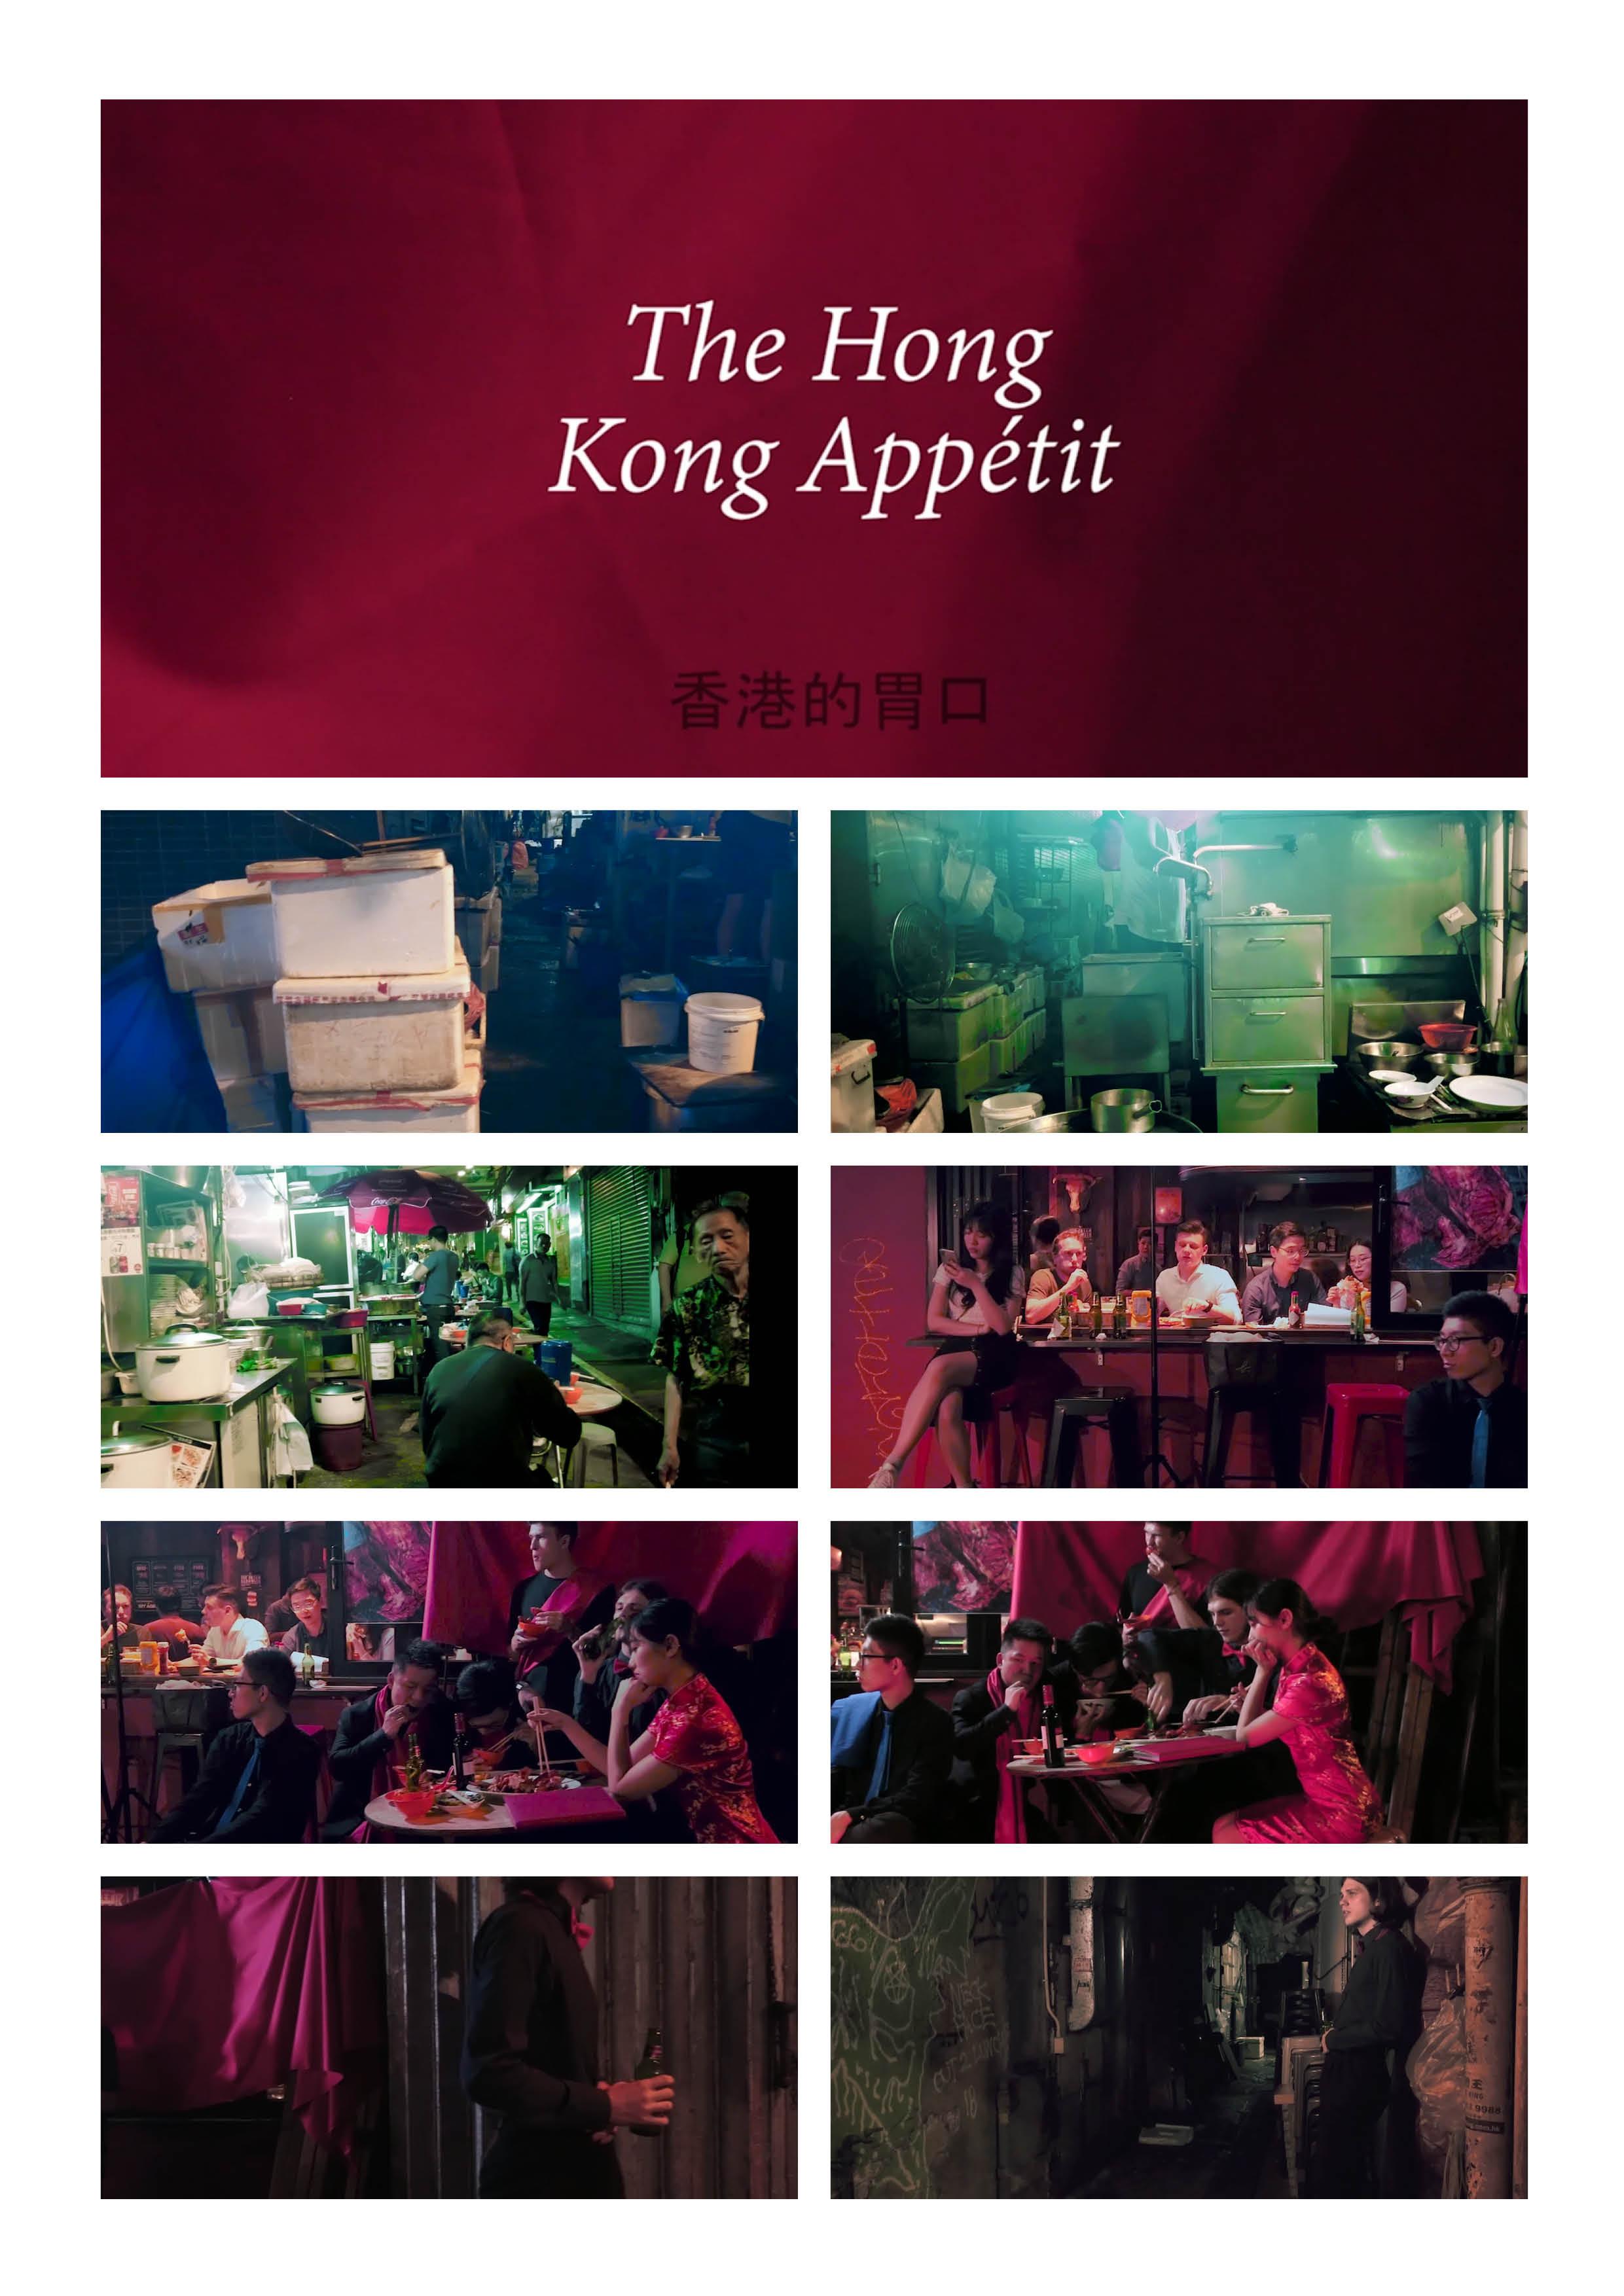 'Hong Kong Appetit' by Mikhail Frantsuzov, 2019.